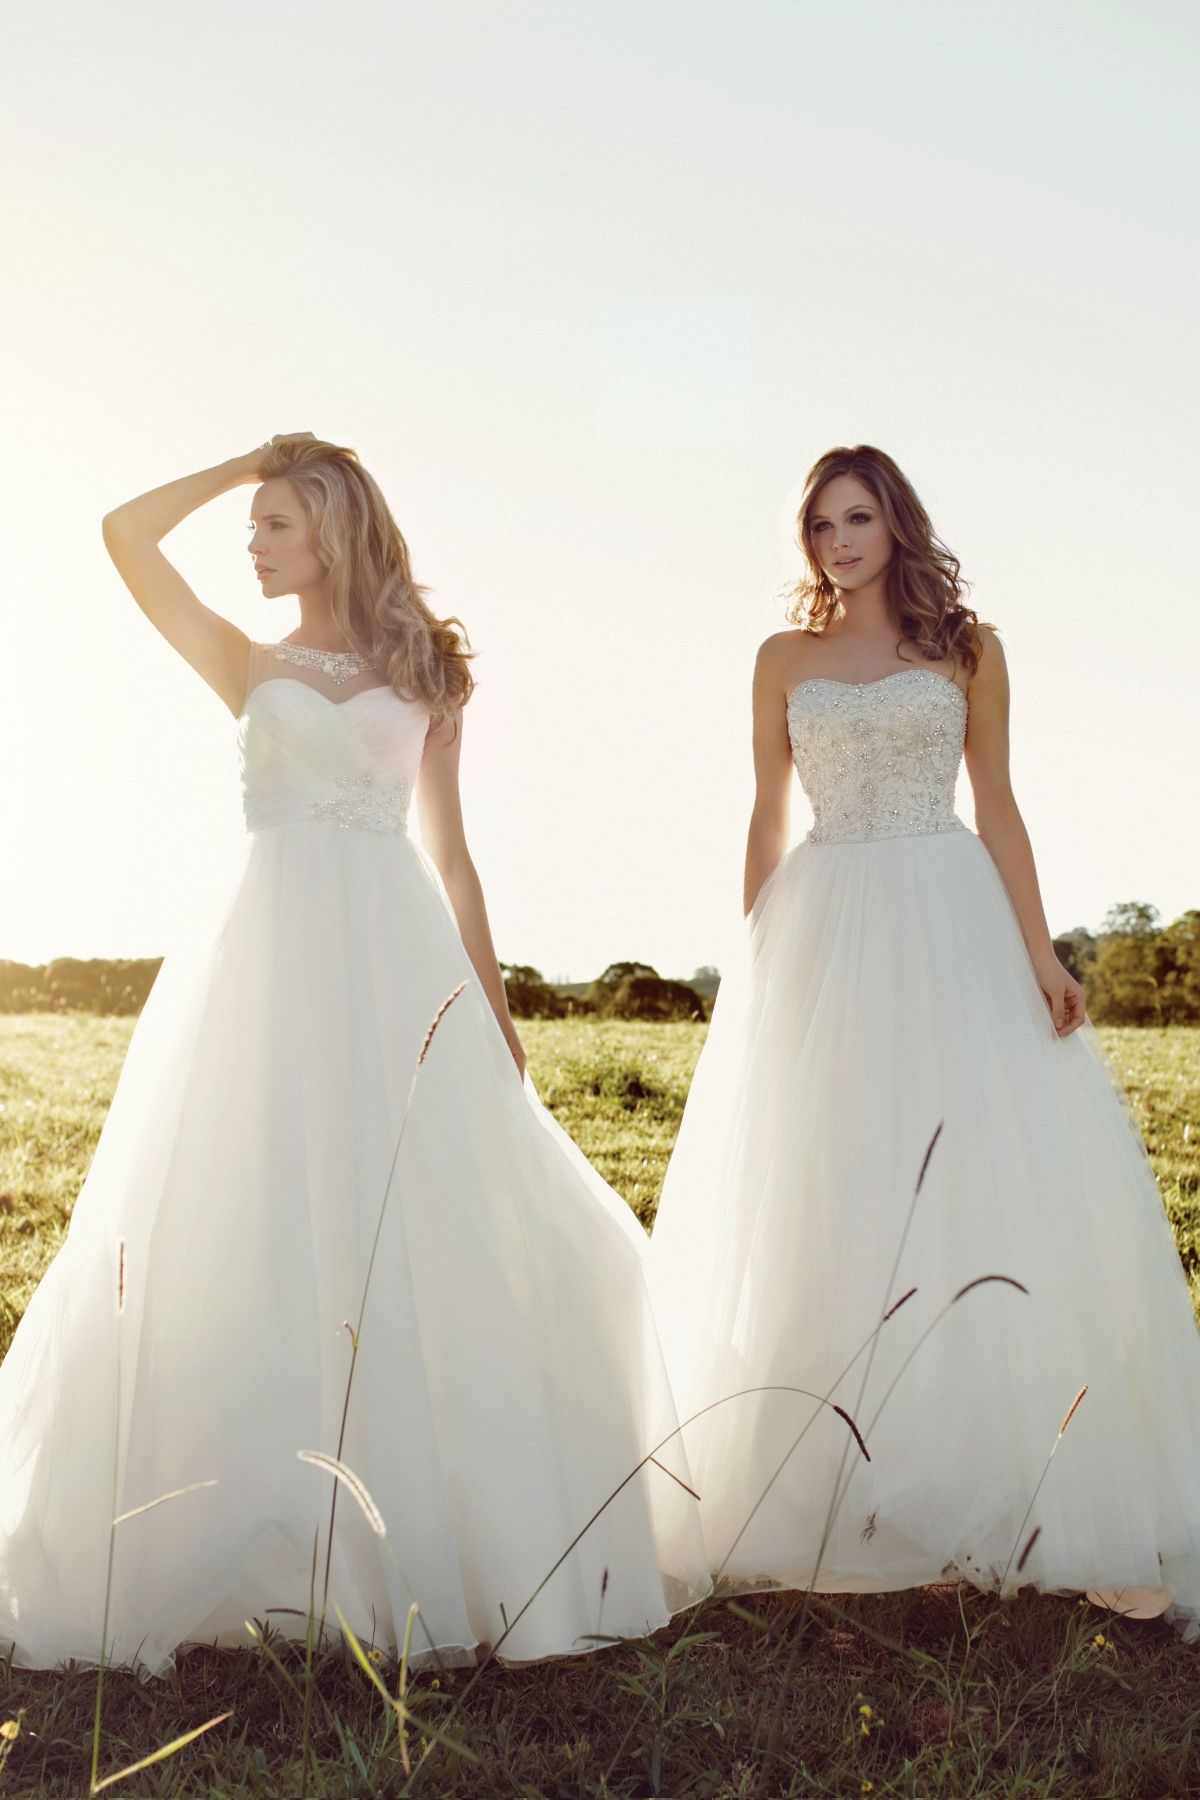 M1546Z Bryce Glam Wedding dresses, 2015 wedding